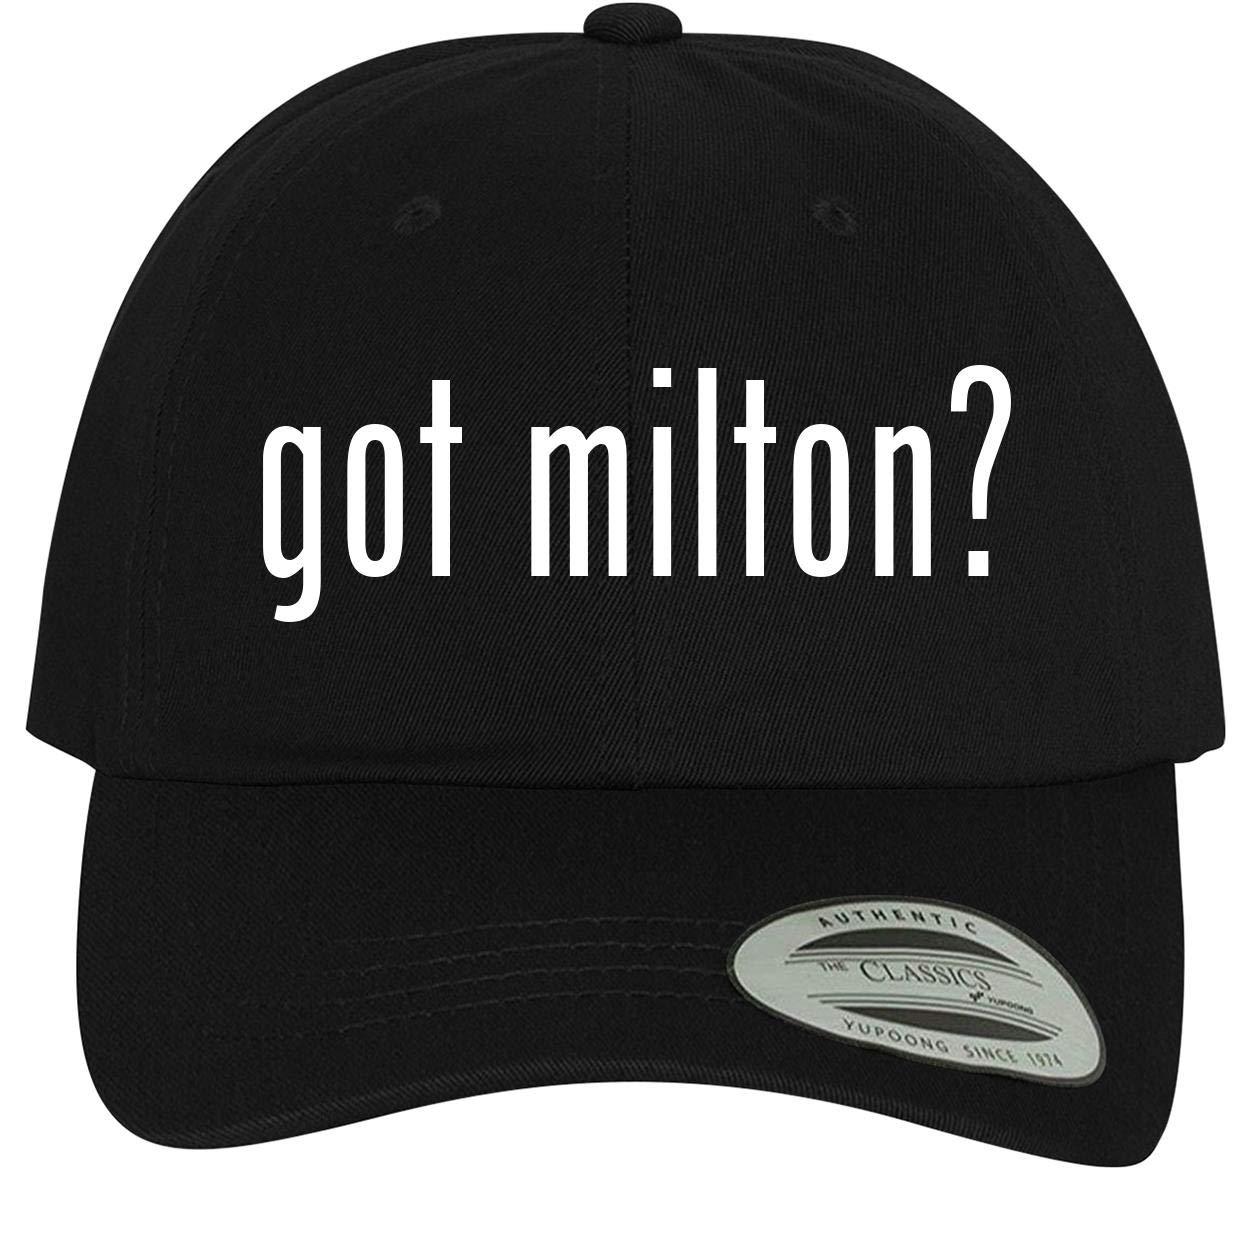 Comfortable Dad Hat Baseball Cap BH Cool Designs got Milton?